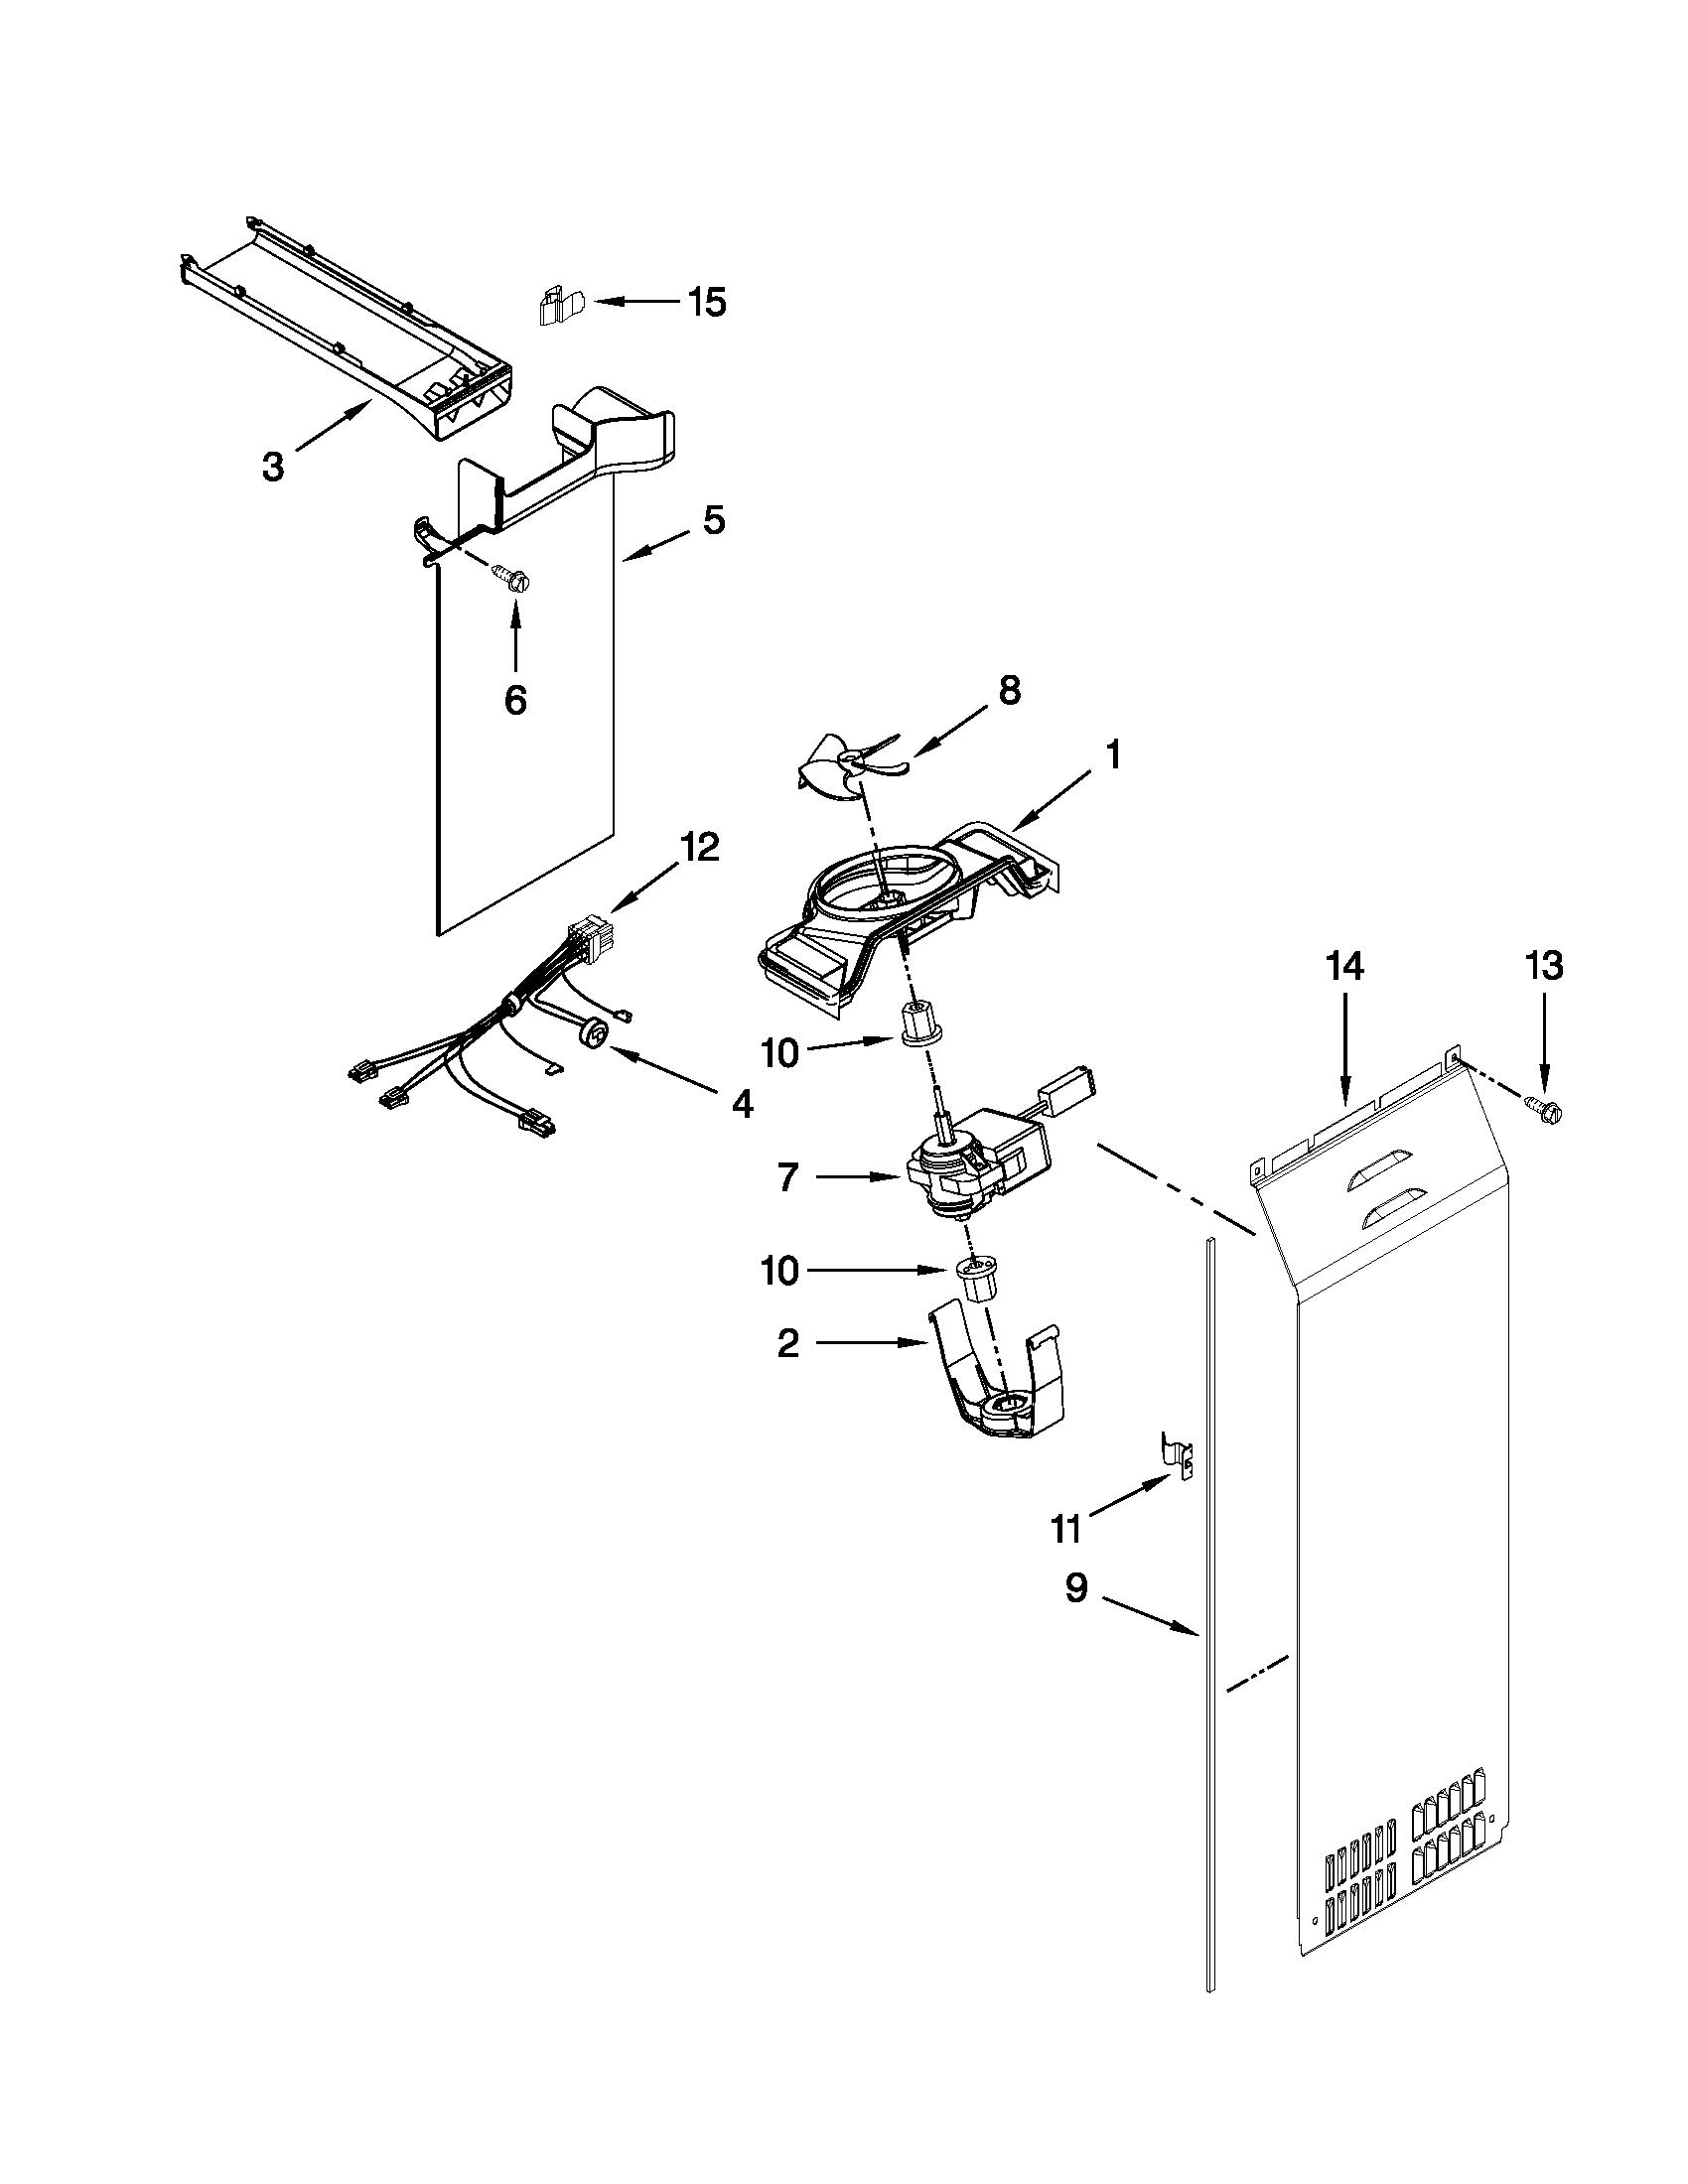 Whirlpool model GSS30C6EYY03 side-by-side refrigerator